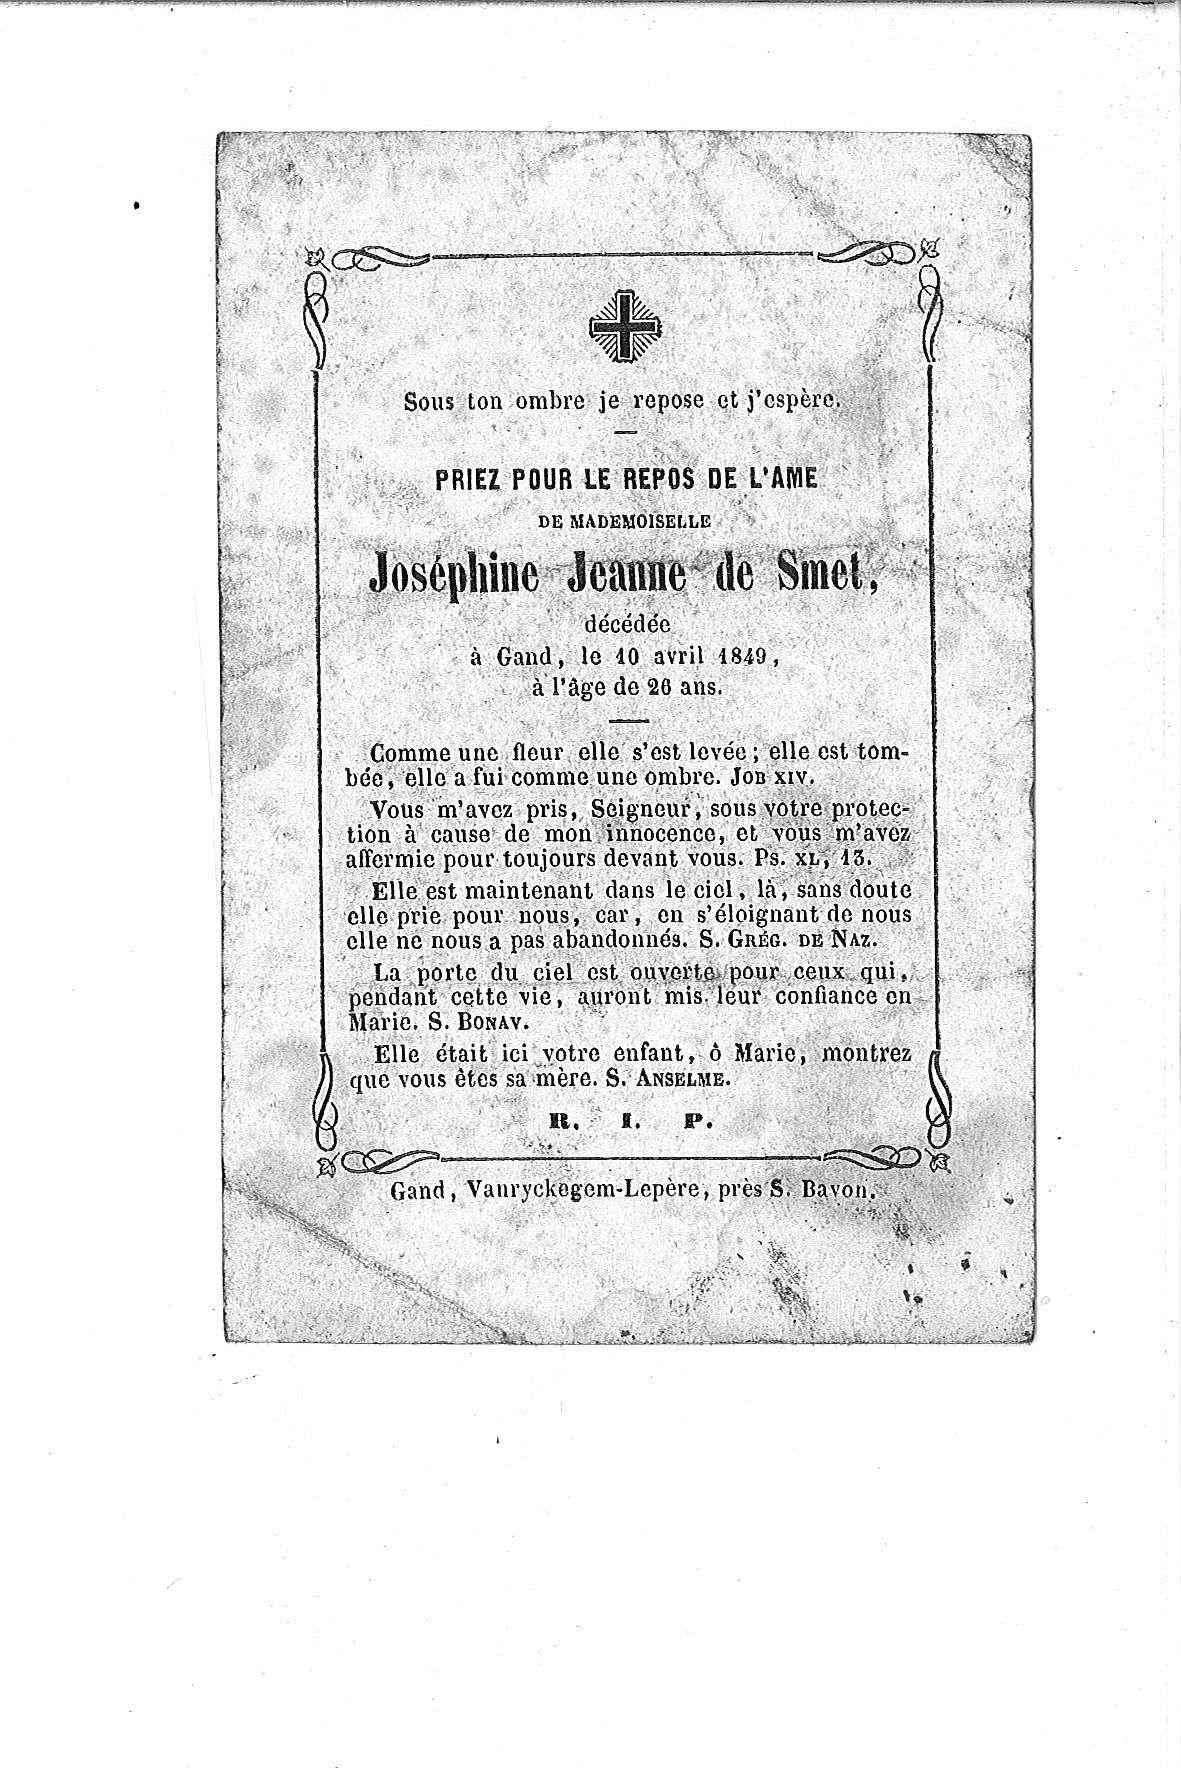 Josephine Jeanne (1849) 20120504095506_00124.jpg